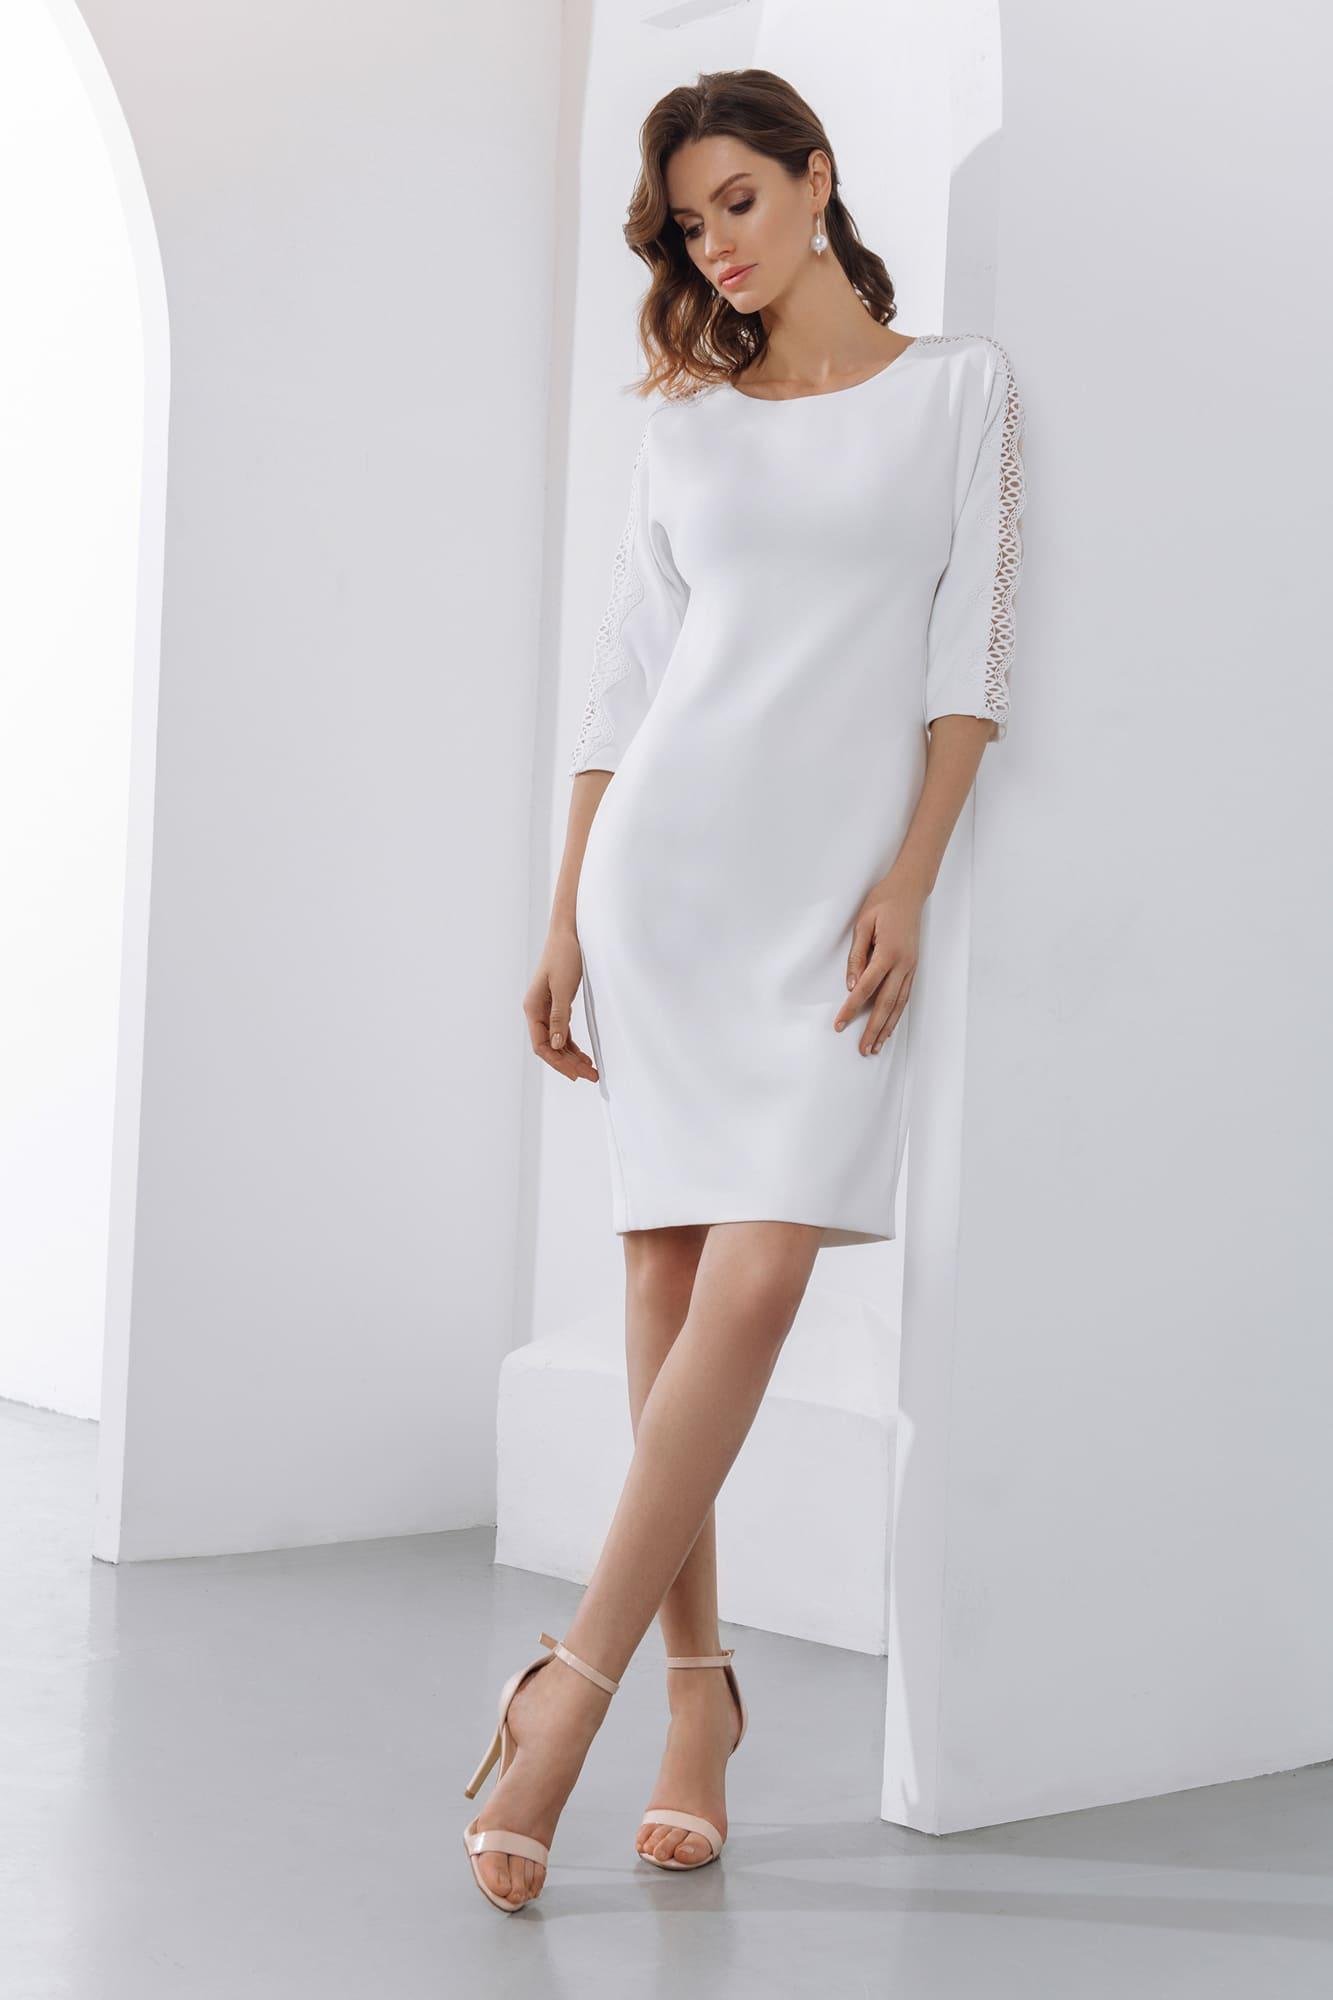 платье футляр купить в москве на корпоратив